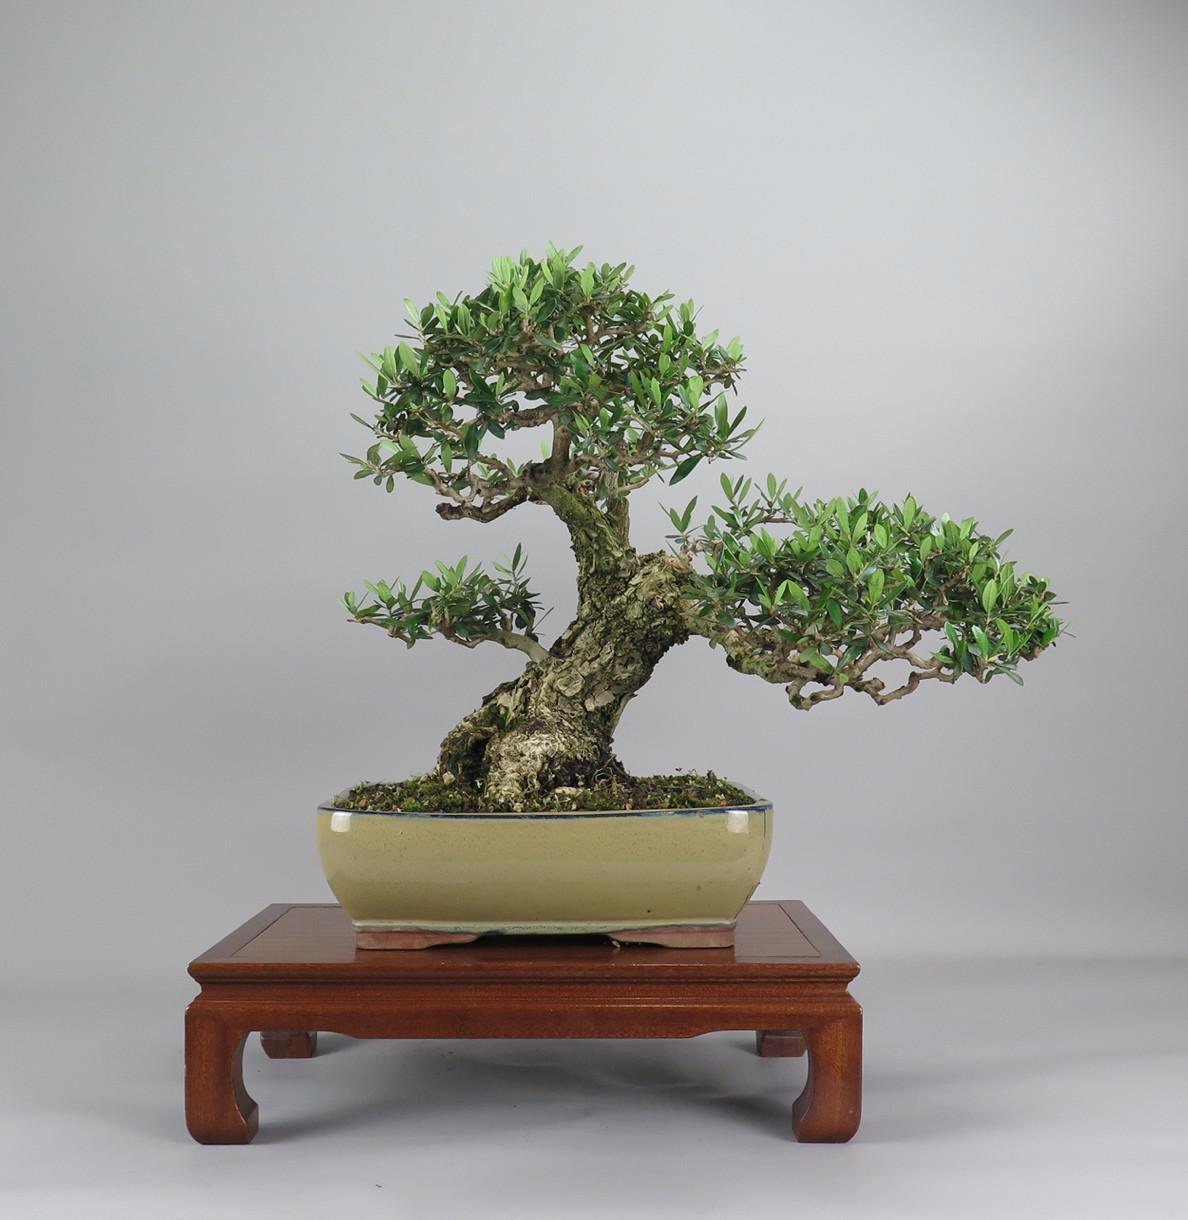 Bonsa de olivo, frente